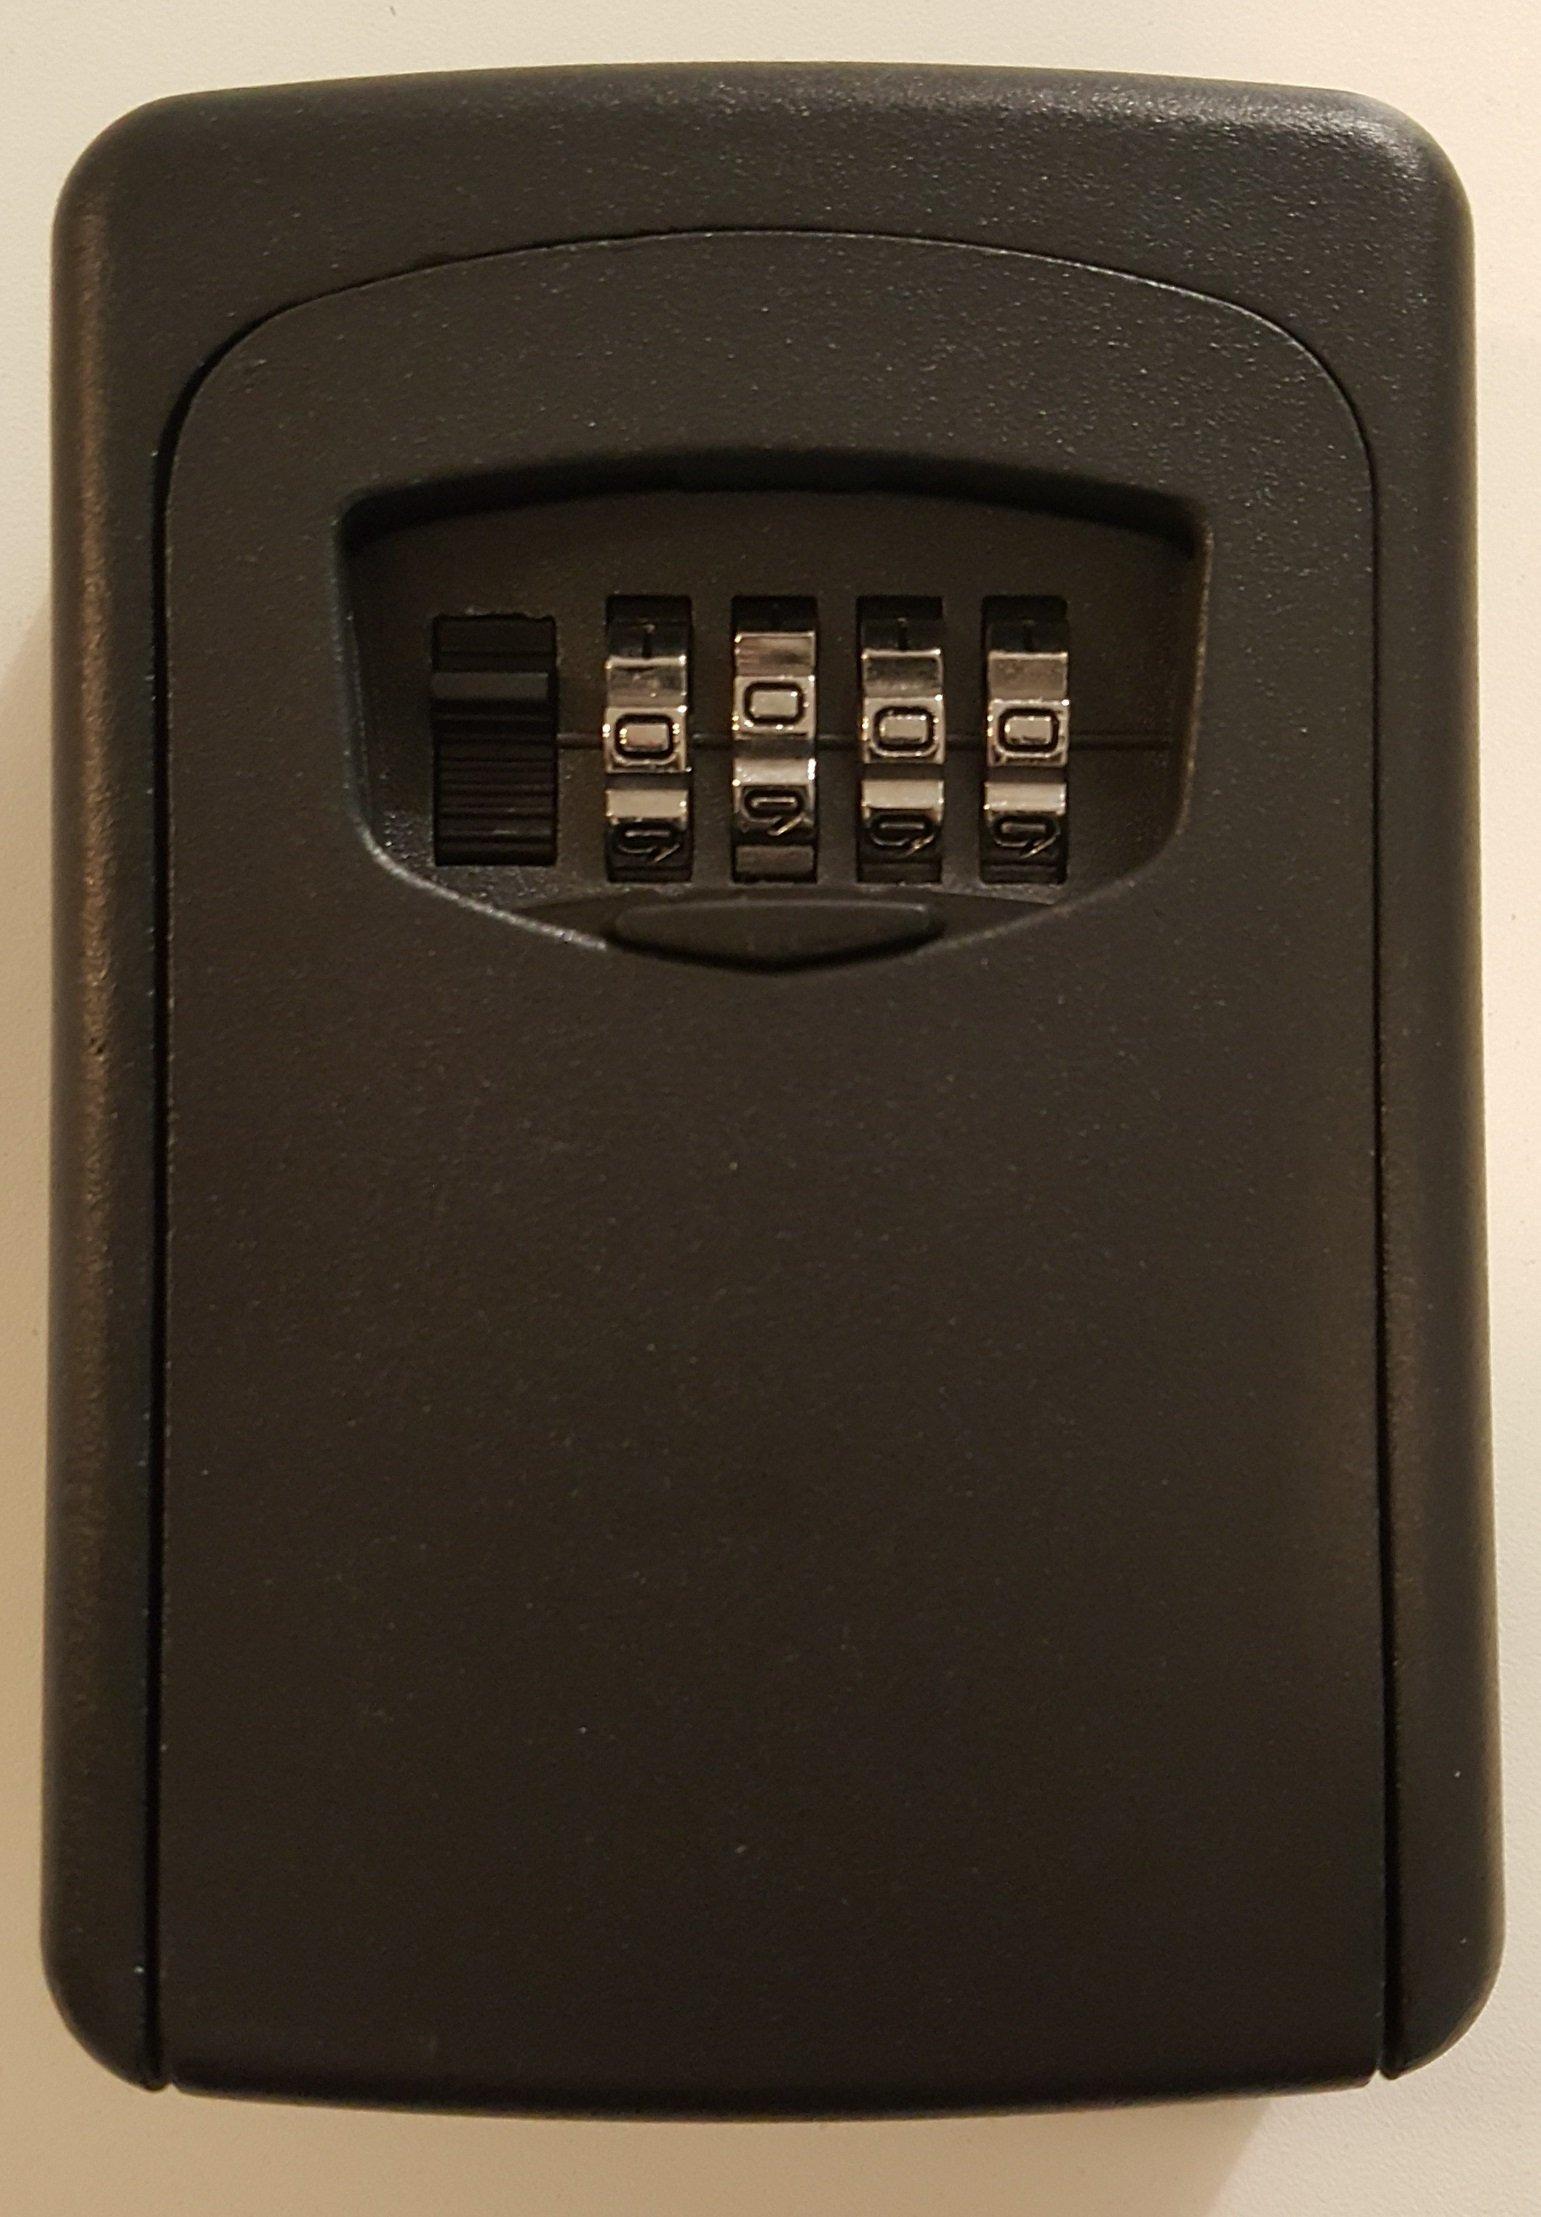 Key Storage Lock Box, Combination Lock Box, Wall Mounted Lock Box Black. black lockbox (Heavy Duty)